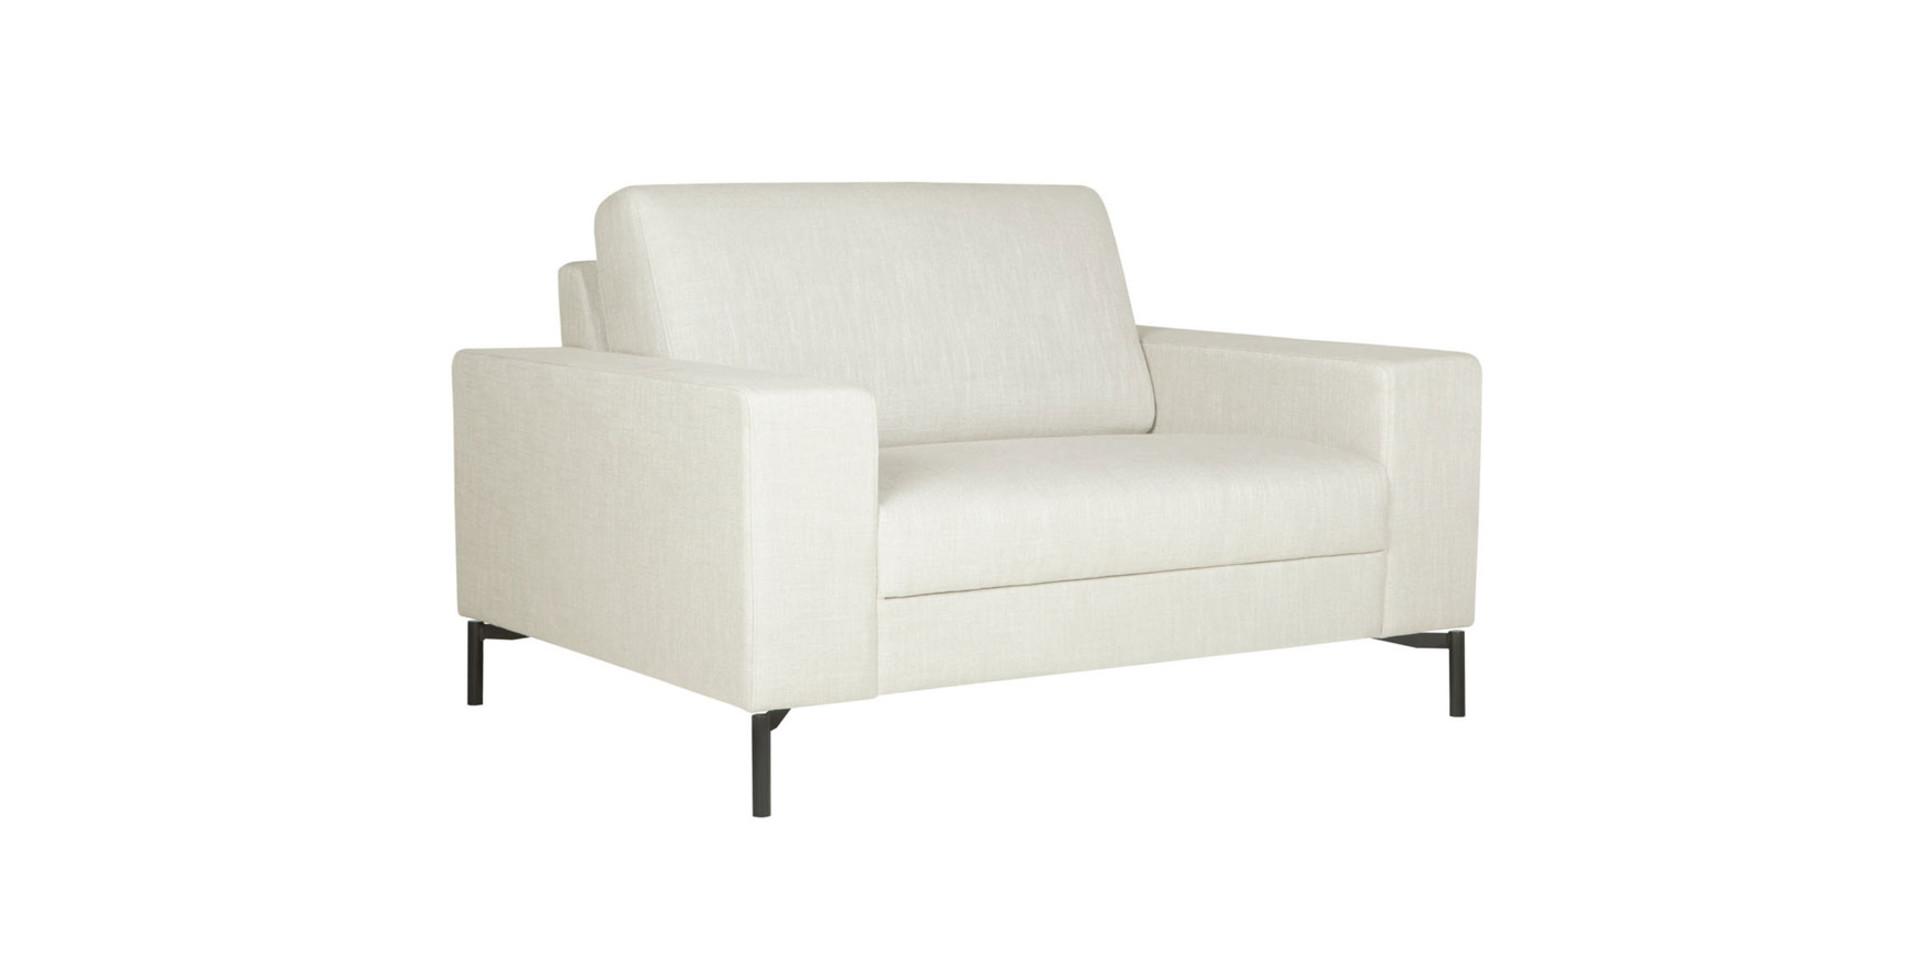 sits-quattro-fauteuil-armchair_darwin25_grey_2_0